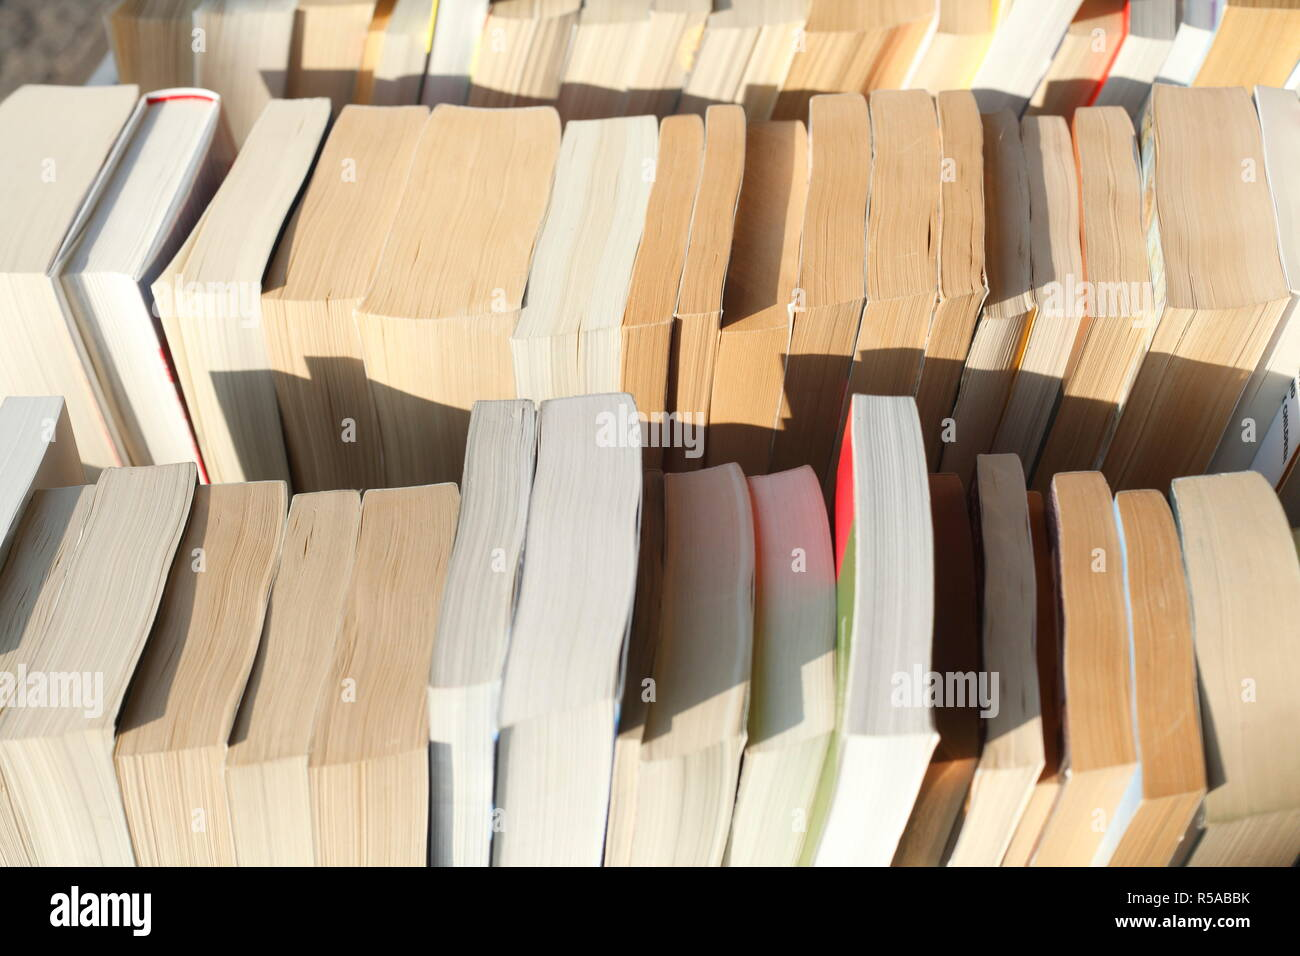 old,used paperbacks - Stock Image